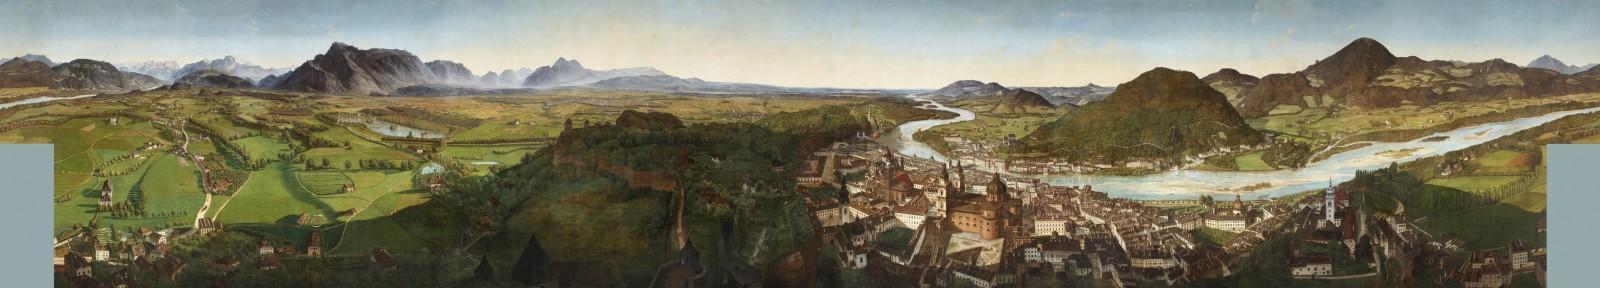 Das Sattler-Panorama ©Salzburg Museum